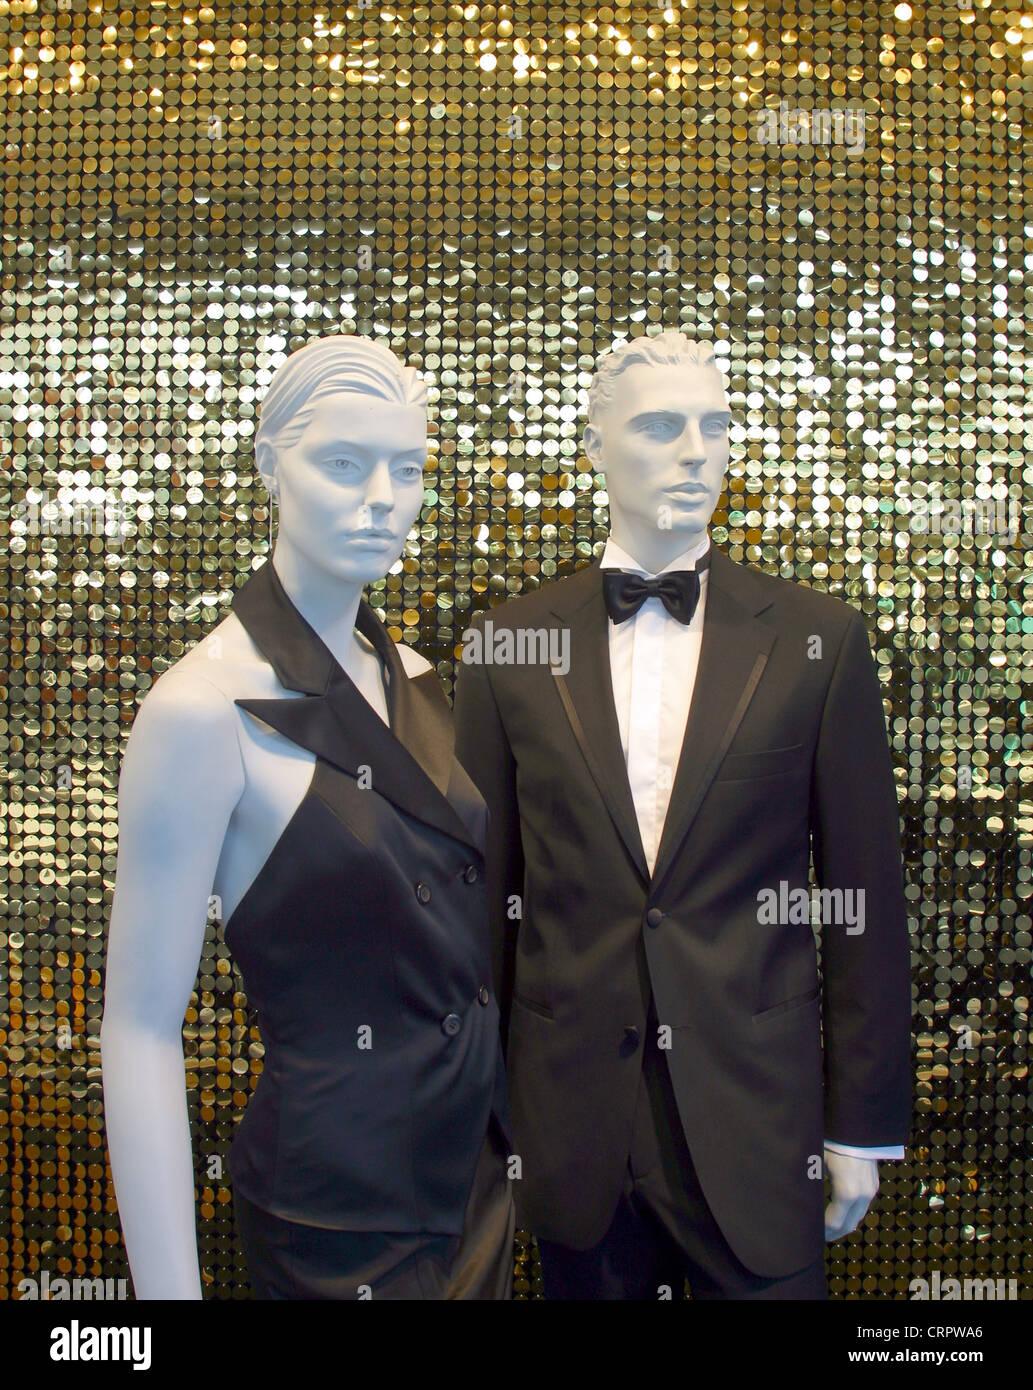 Mannequins in a black dress uniform - Stock Image